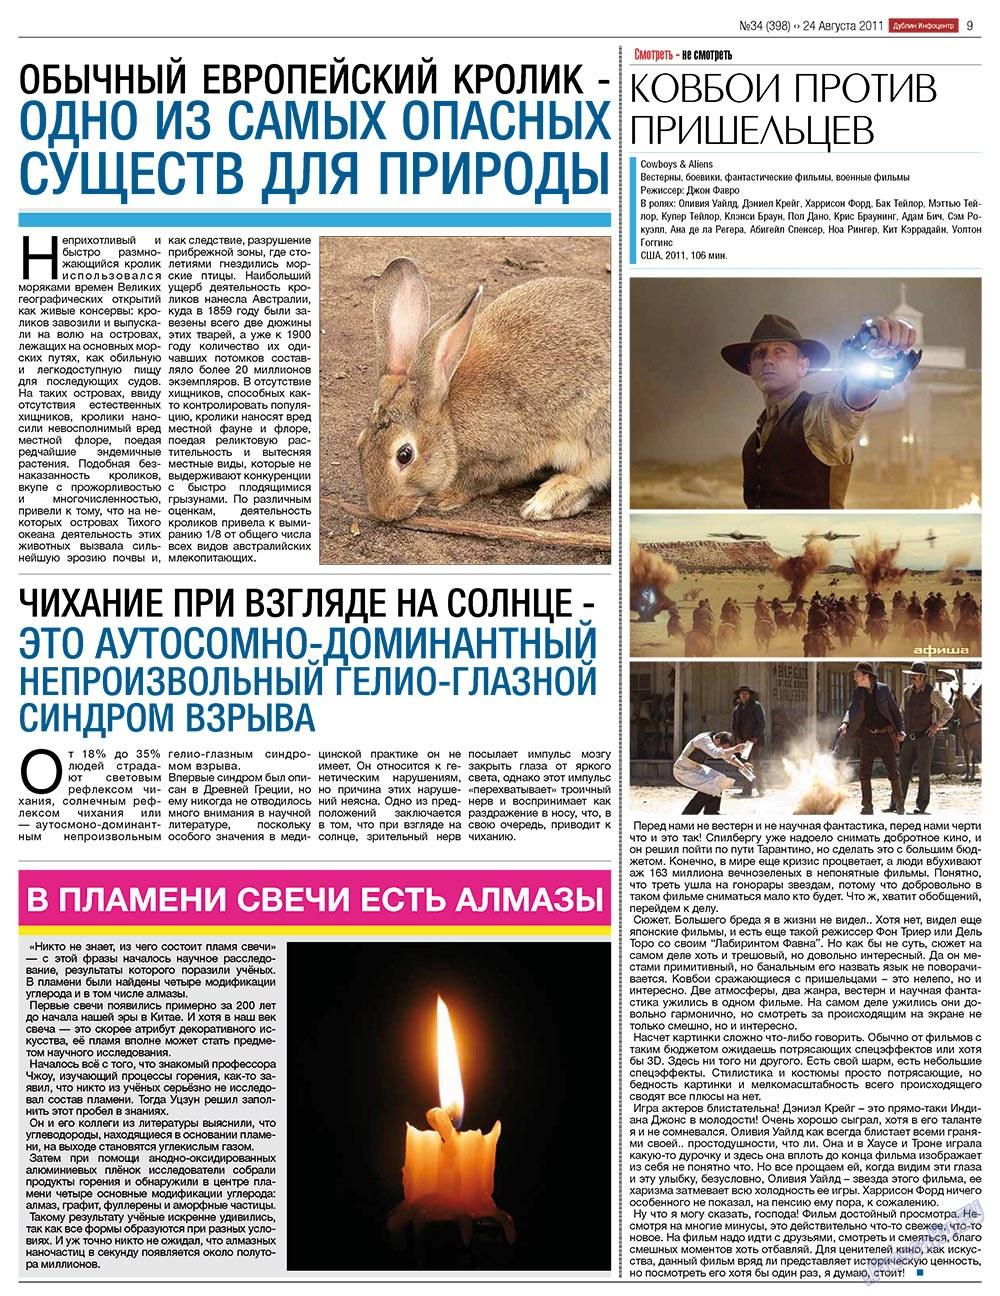 Дублин инфоцентр (газета). 2011 год, номер 34, стр. 9